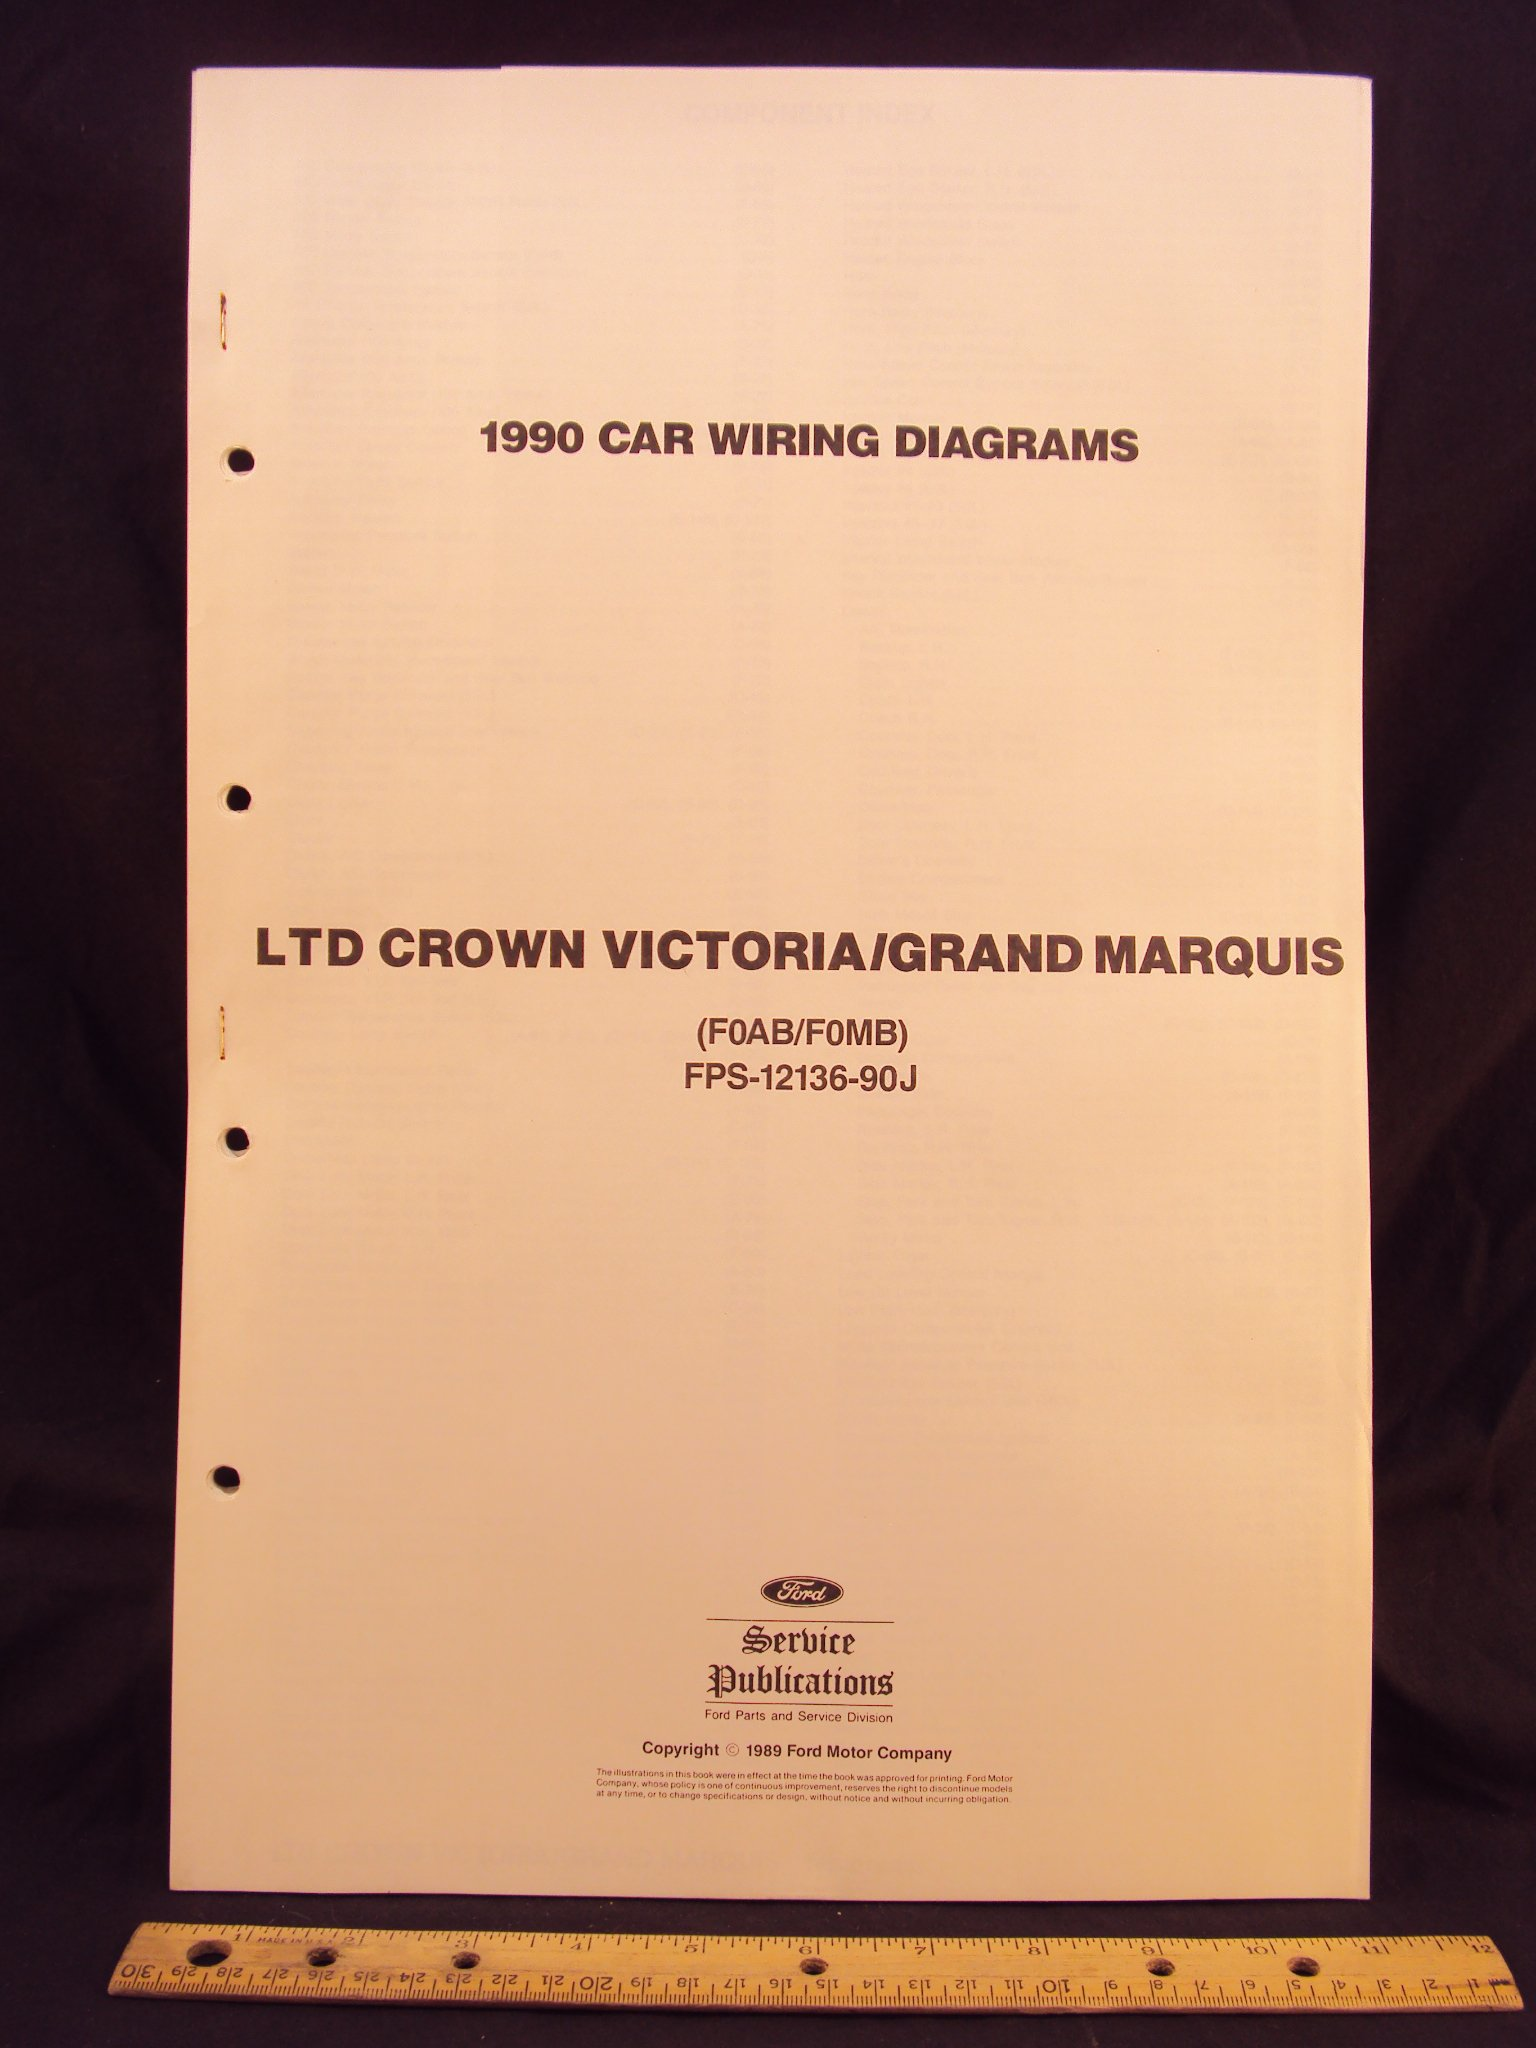 1990 FORD LTD Crown Victoria & MERCURY Grand Marquis Electrical Wiring  Diagrams / Schematics: Ford Motor Company: Amazon.com: BooksAmazon.com